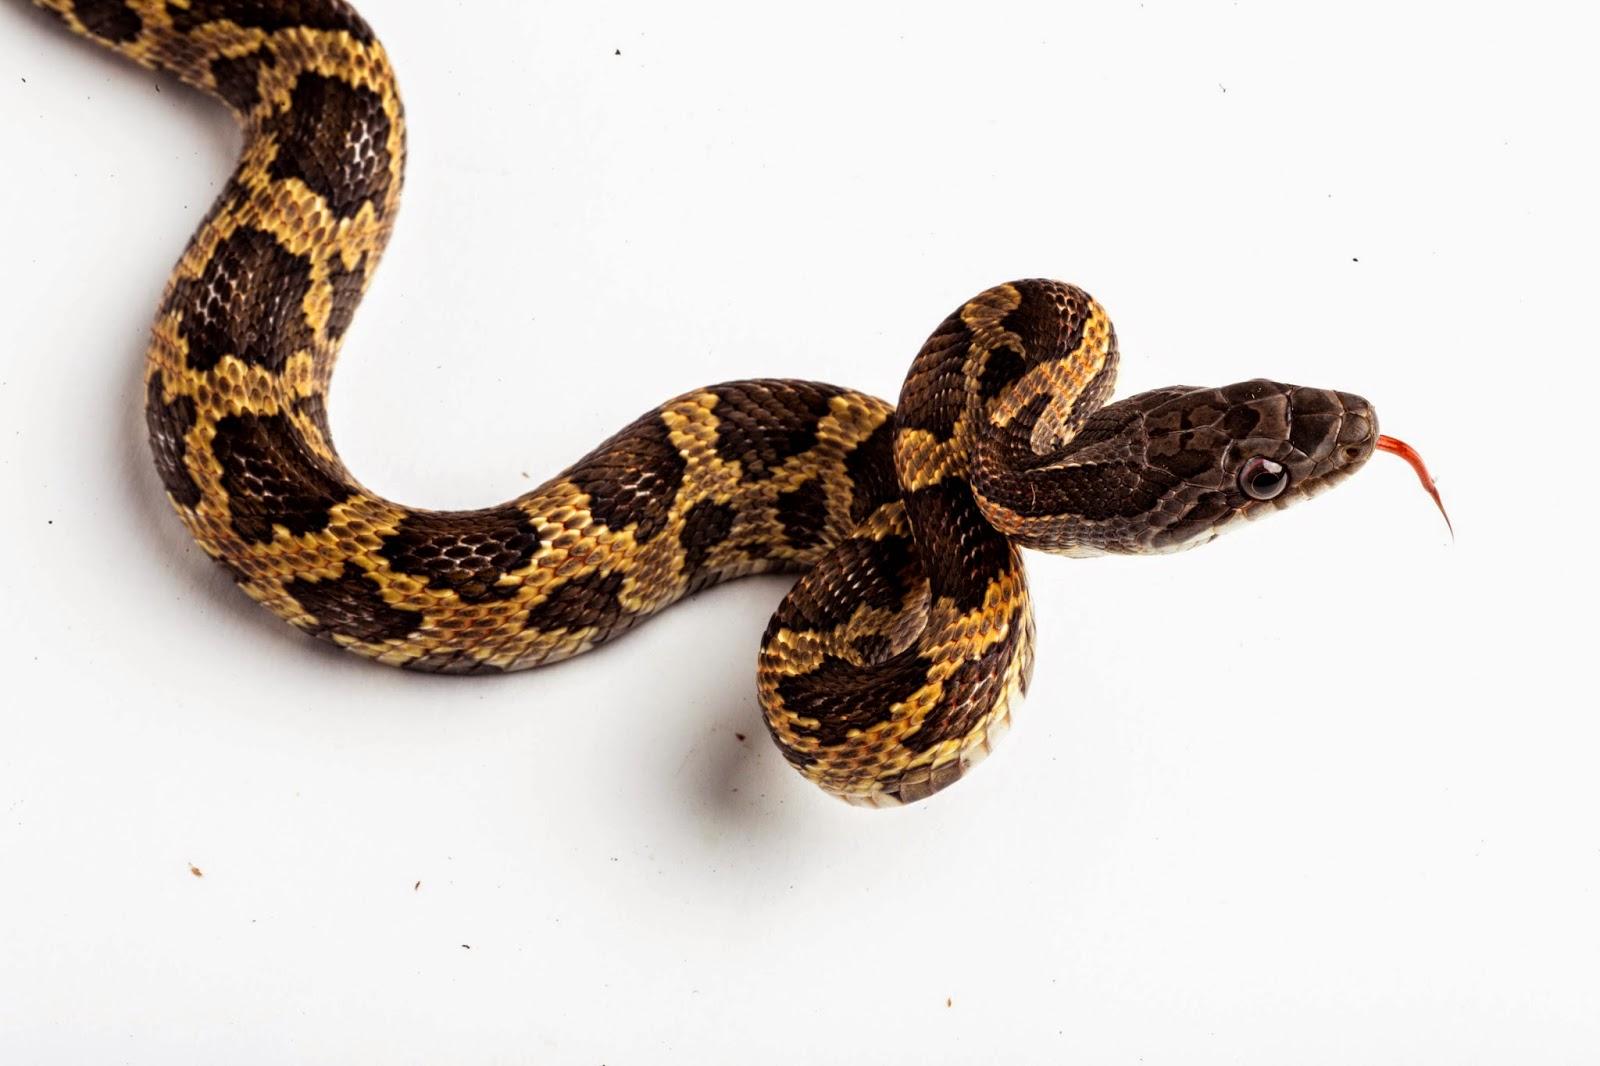 rat snake texas images - photo #23